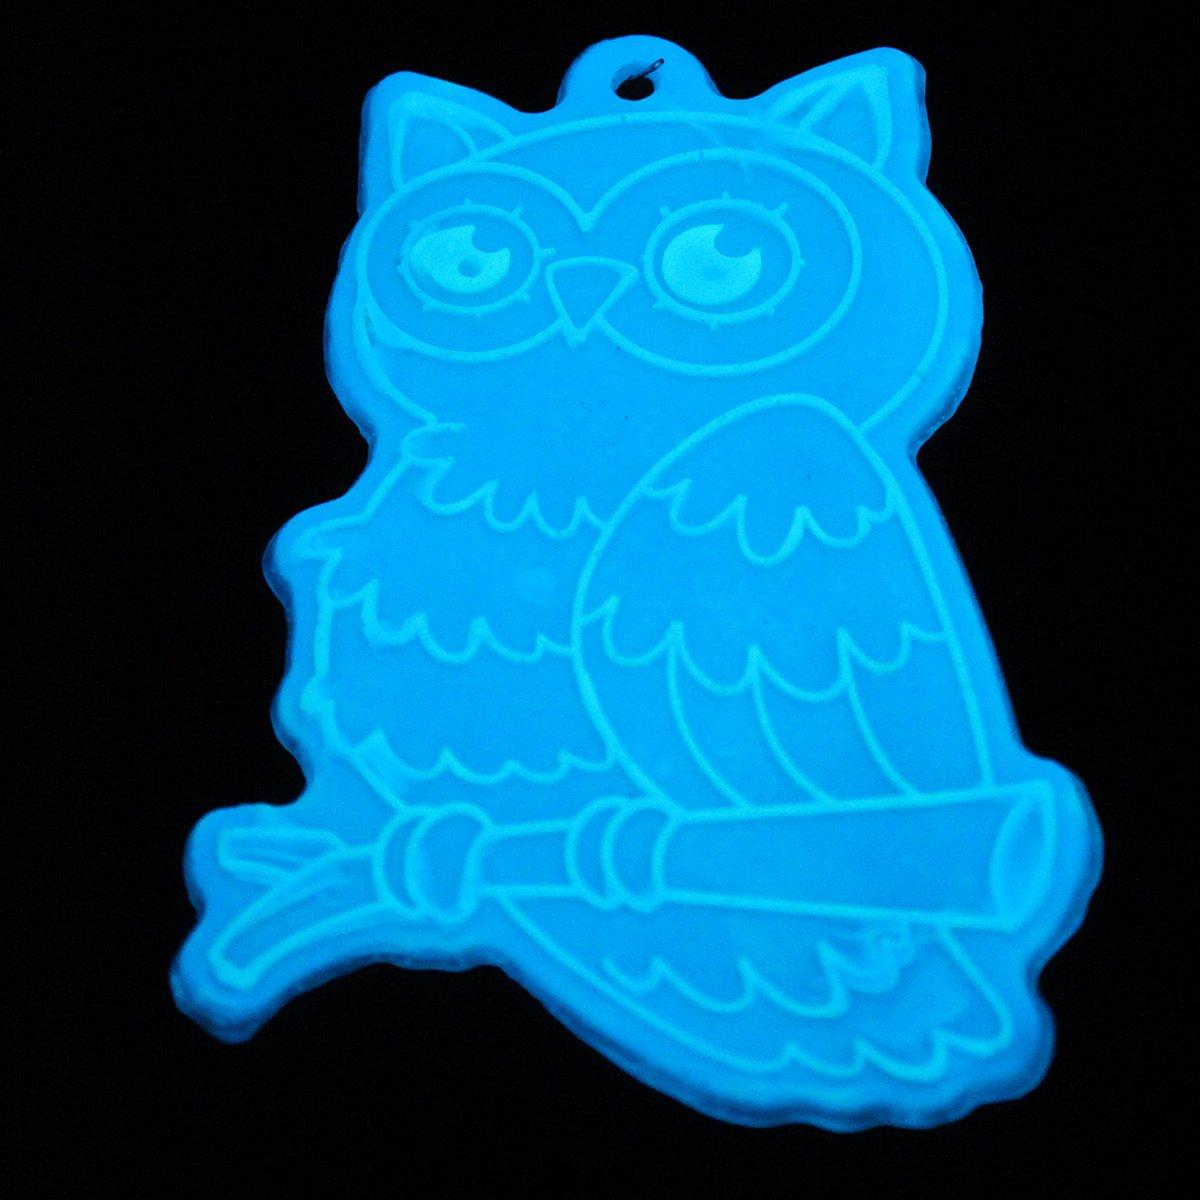 Blue Glow in the Dark & UV Reactive Pigment Powder - 500 Grams by Techno Glow Inc (Image #6)